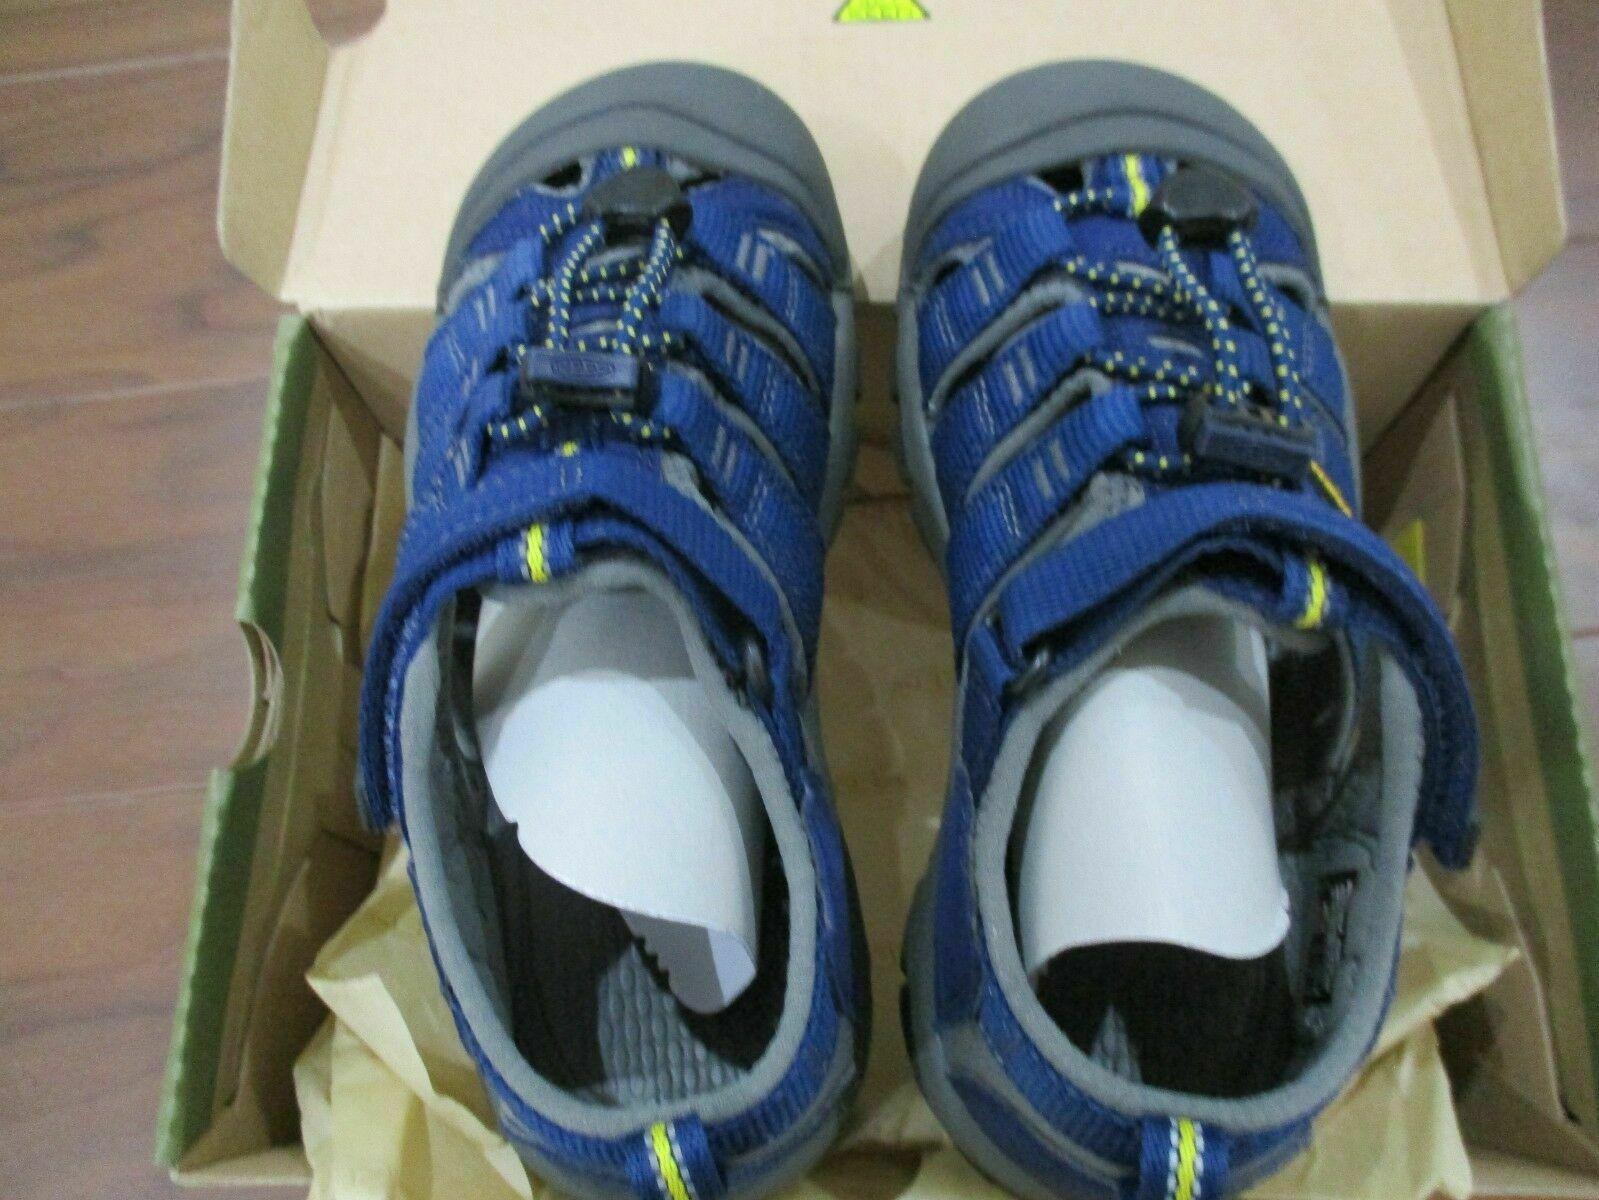 BNIB Keen Newport H2 Youth Boys sandals, pick size, Blue, ships w/o box